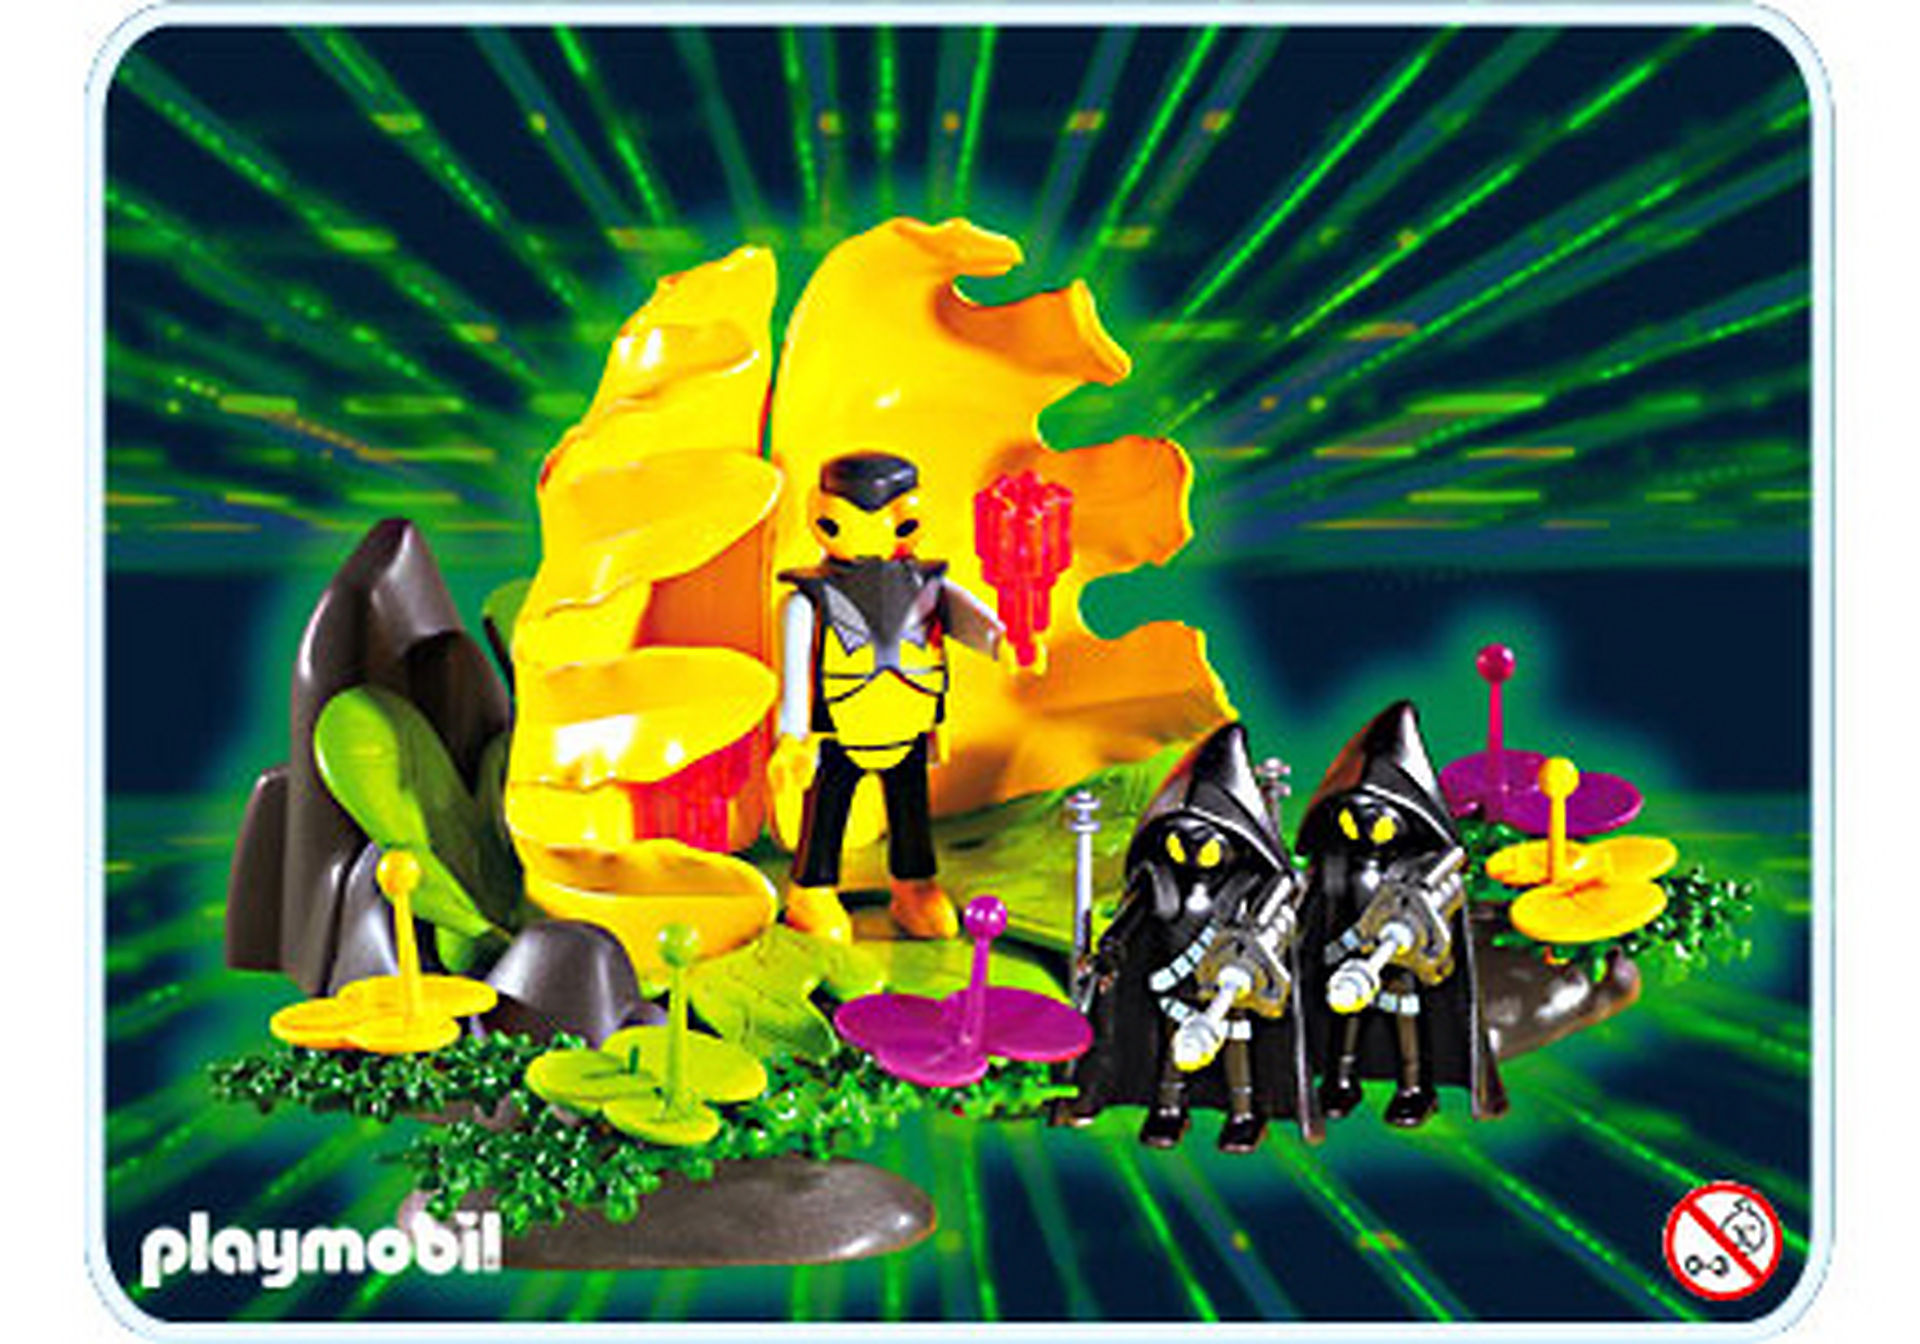 http://media.playmobil.com/i/playmobil/3283-A_product_detail/Martiens/plante carnivore